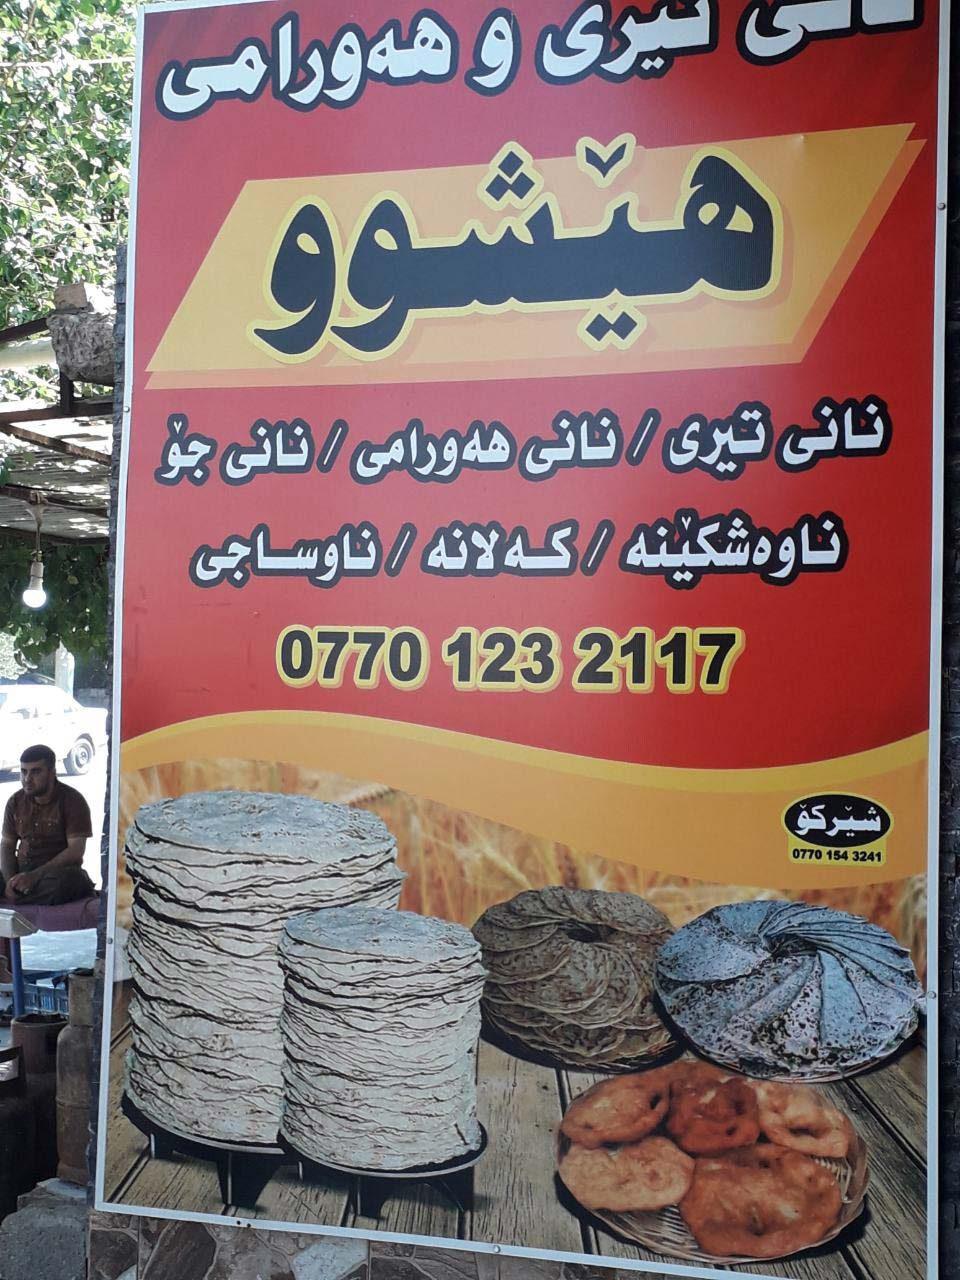 iraq-inset-1-260819-e1566847125999.jpg